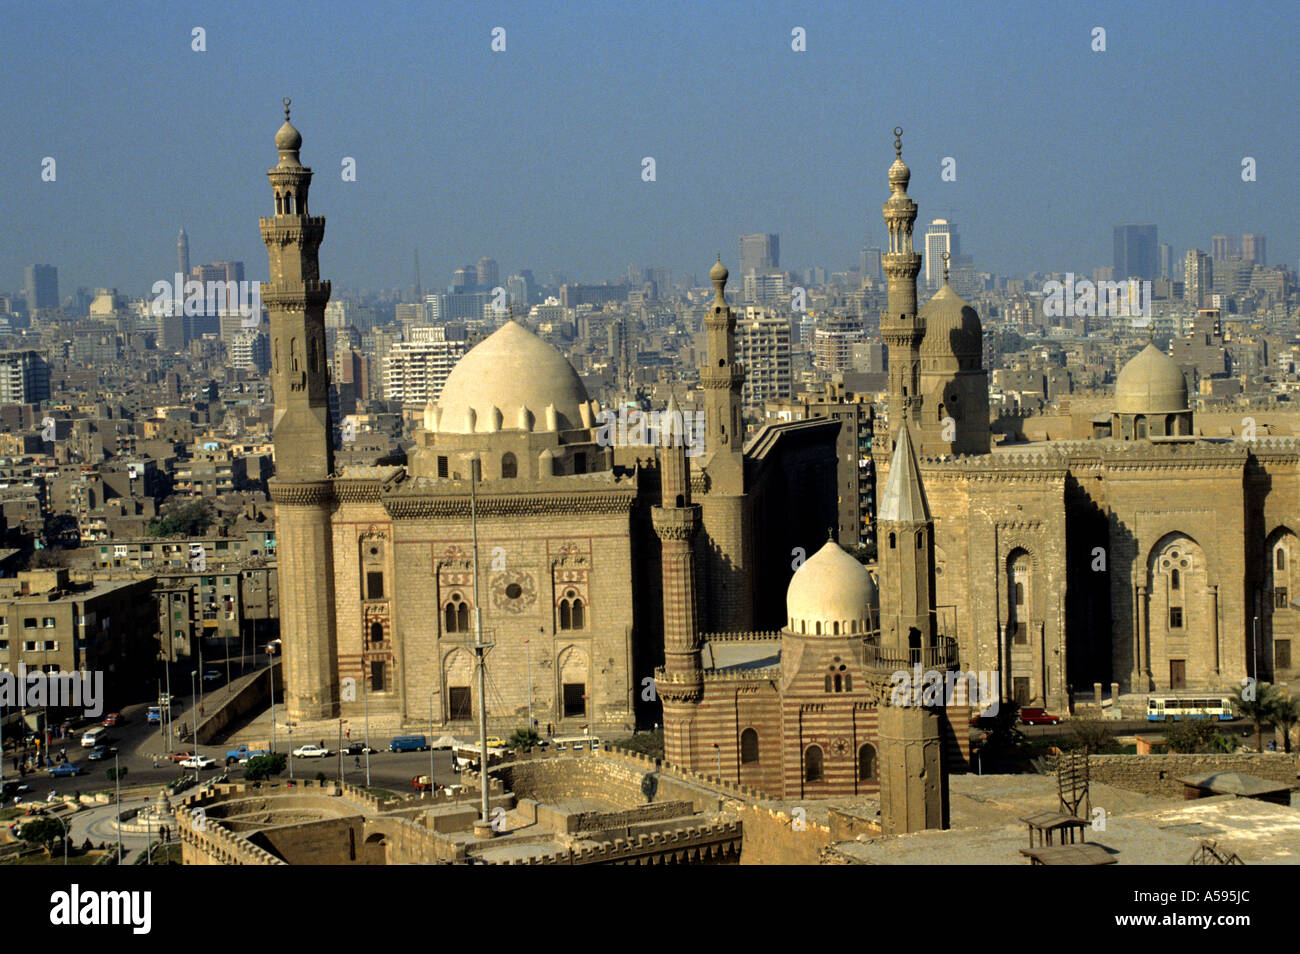 arab architecture muslim moslem cairo city cities egypt stock photo 6421739 alamy. Black Bedroom Furniture Sets. Home Design Ideas